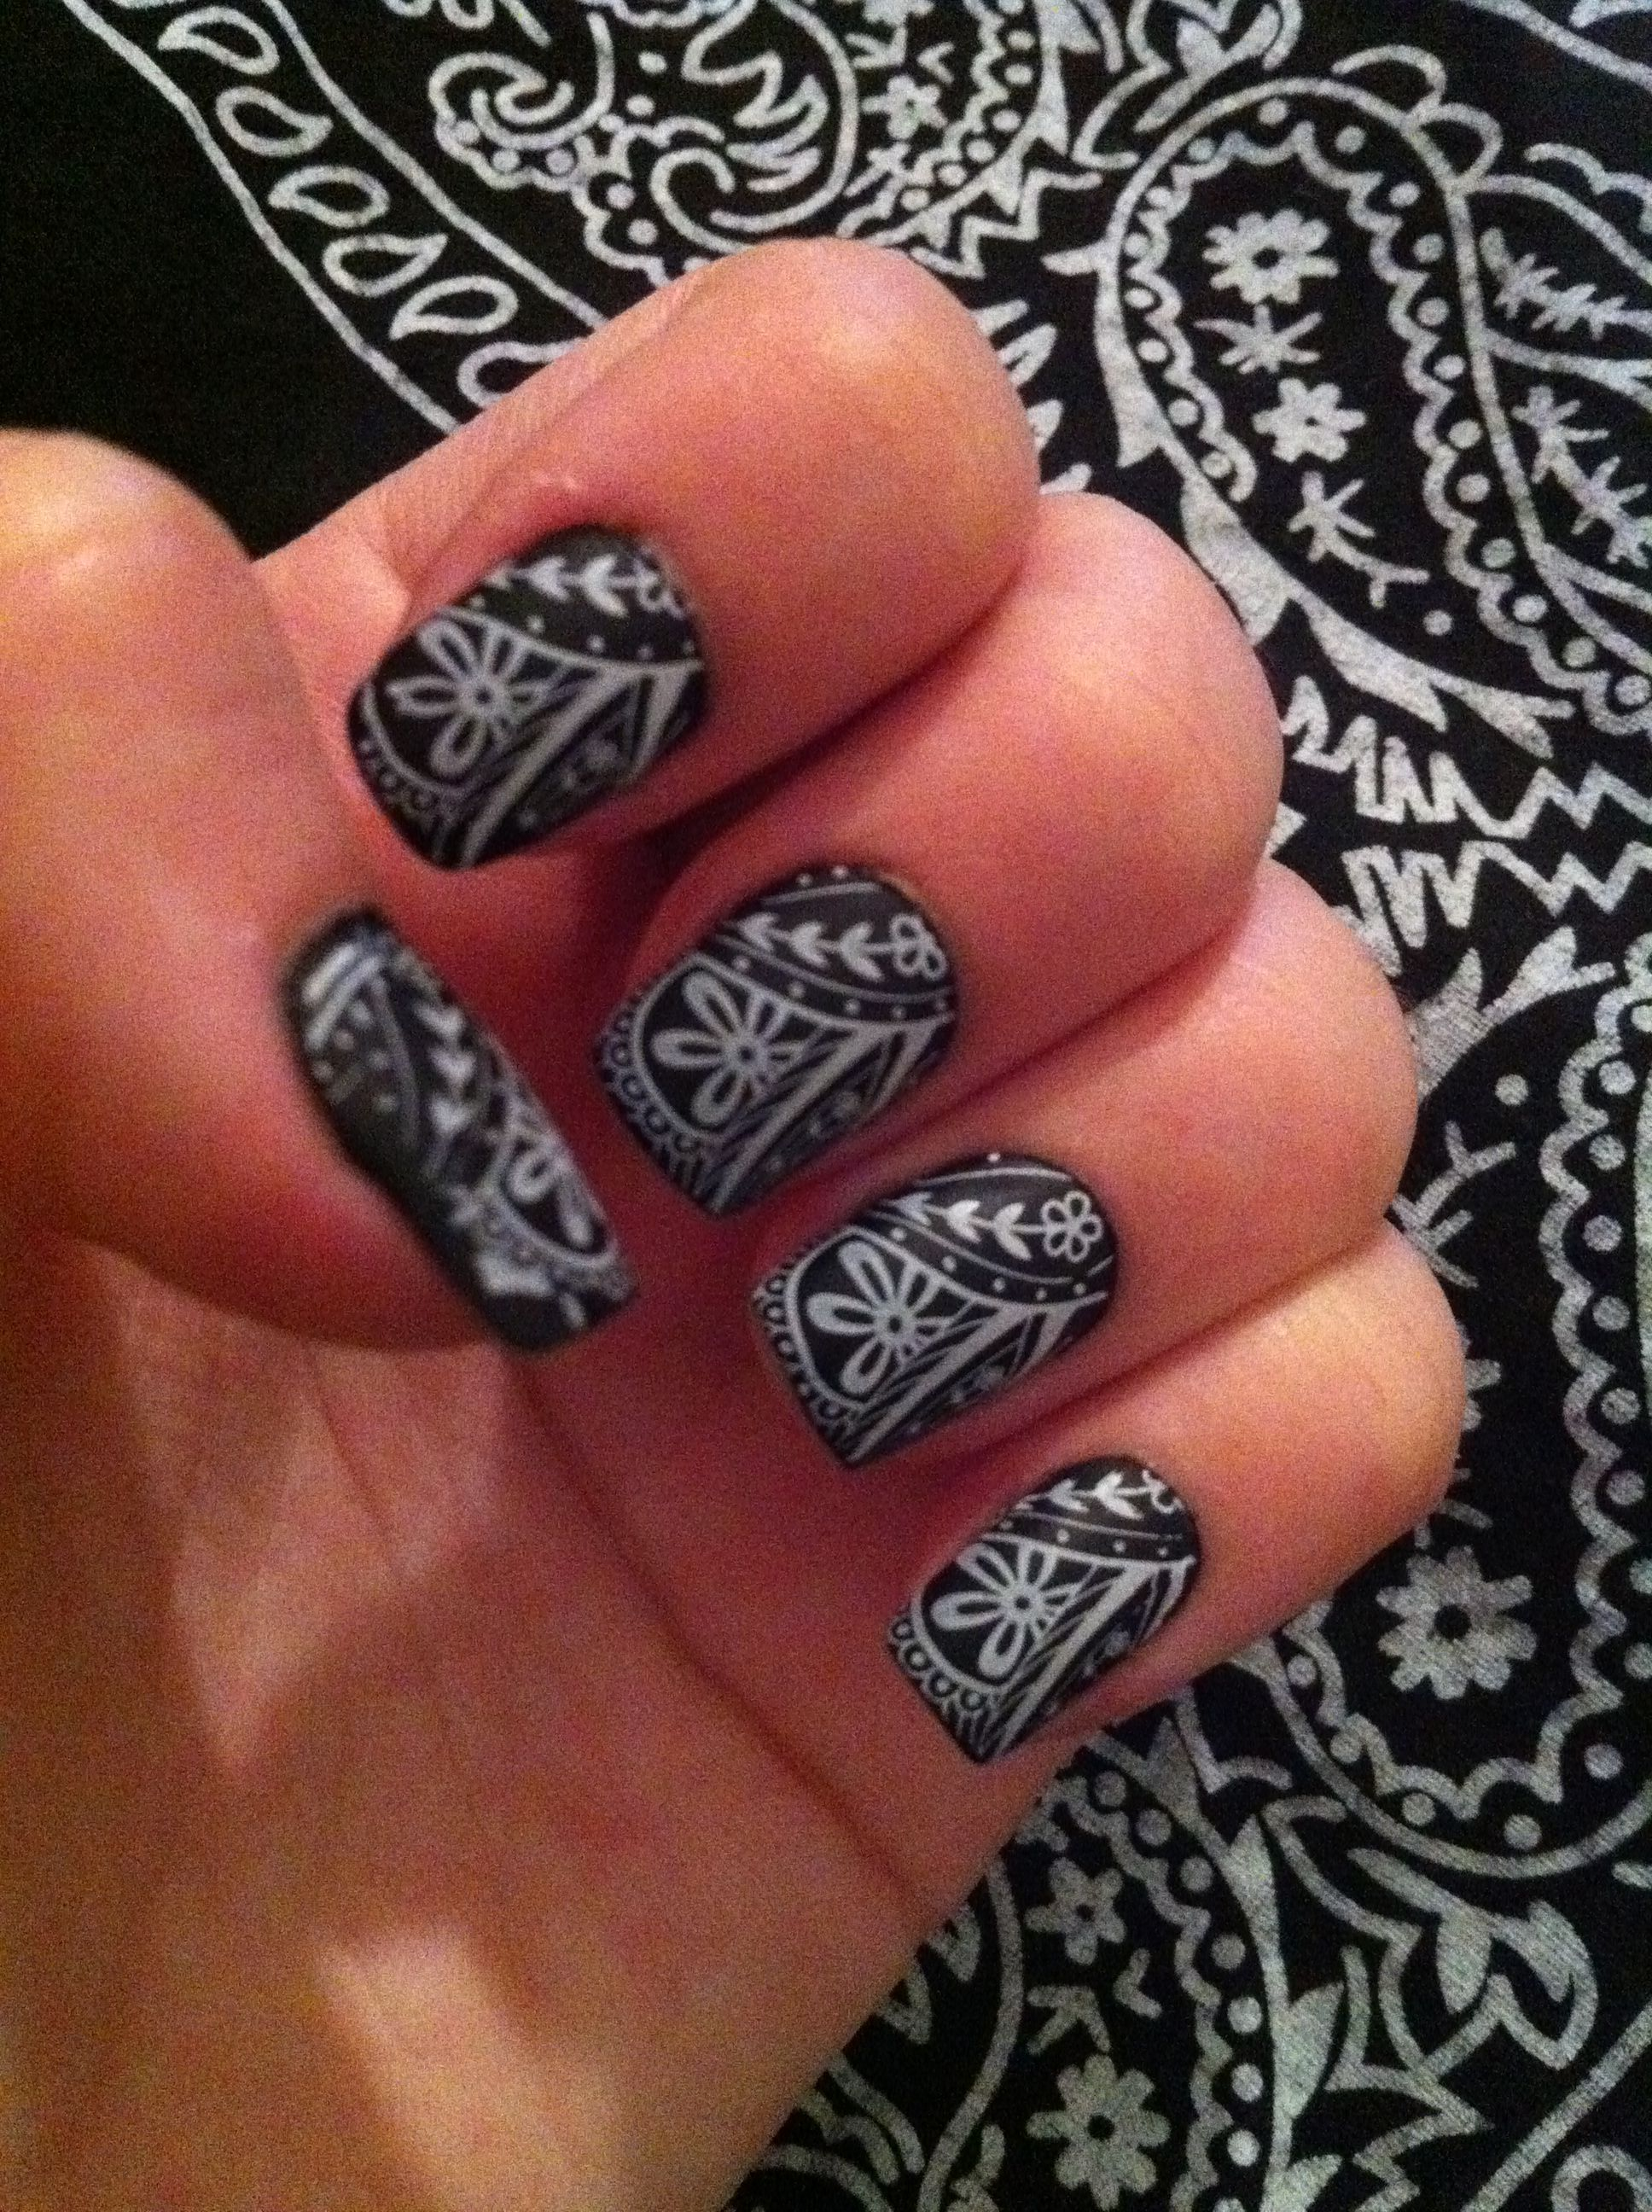 Pin van Crystal Giachetti op Nail art! | Pinterest